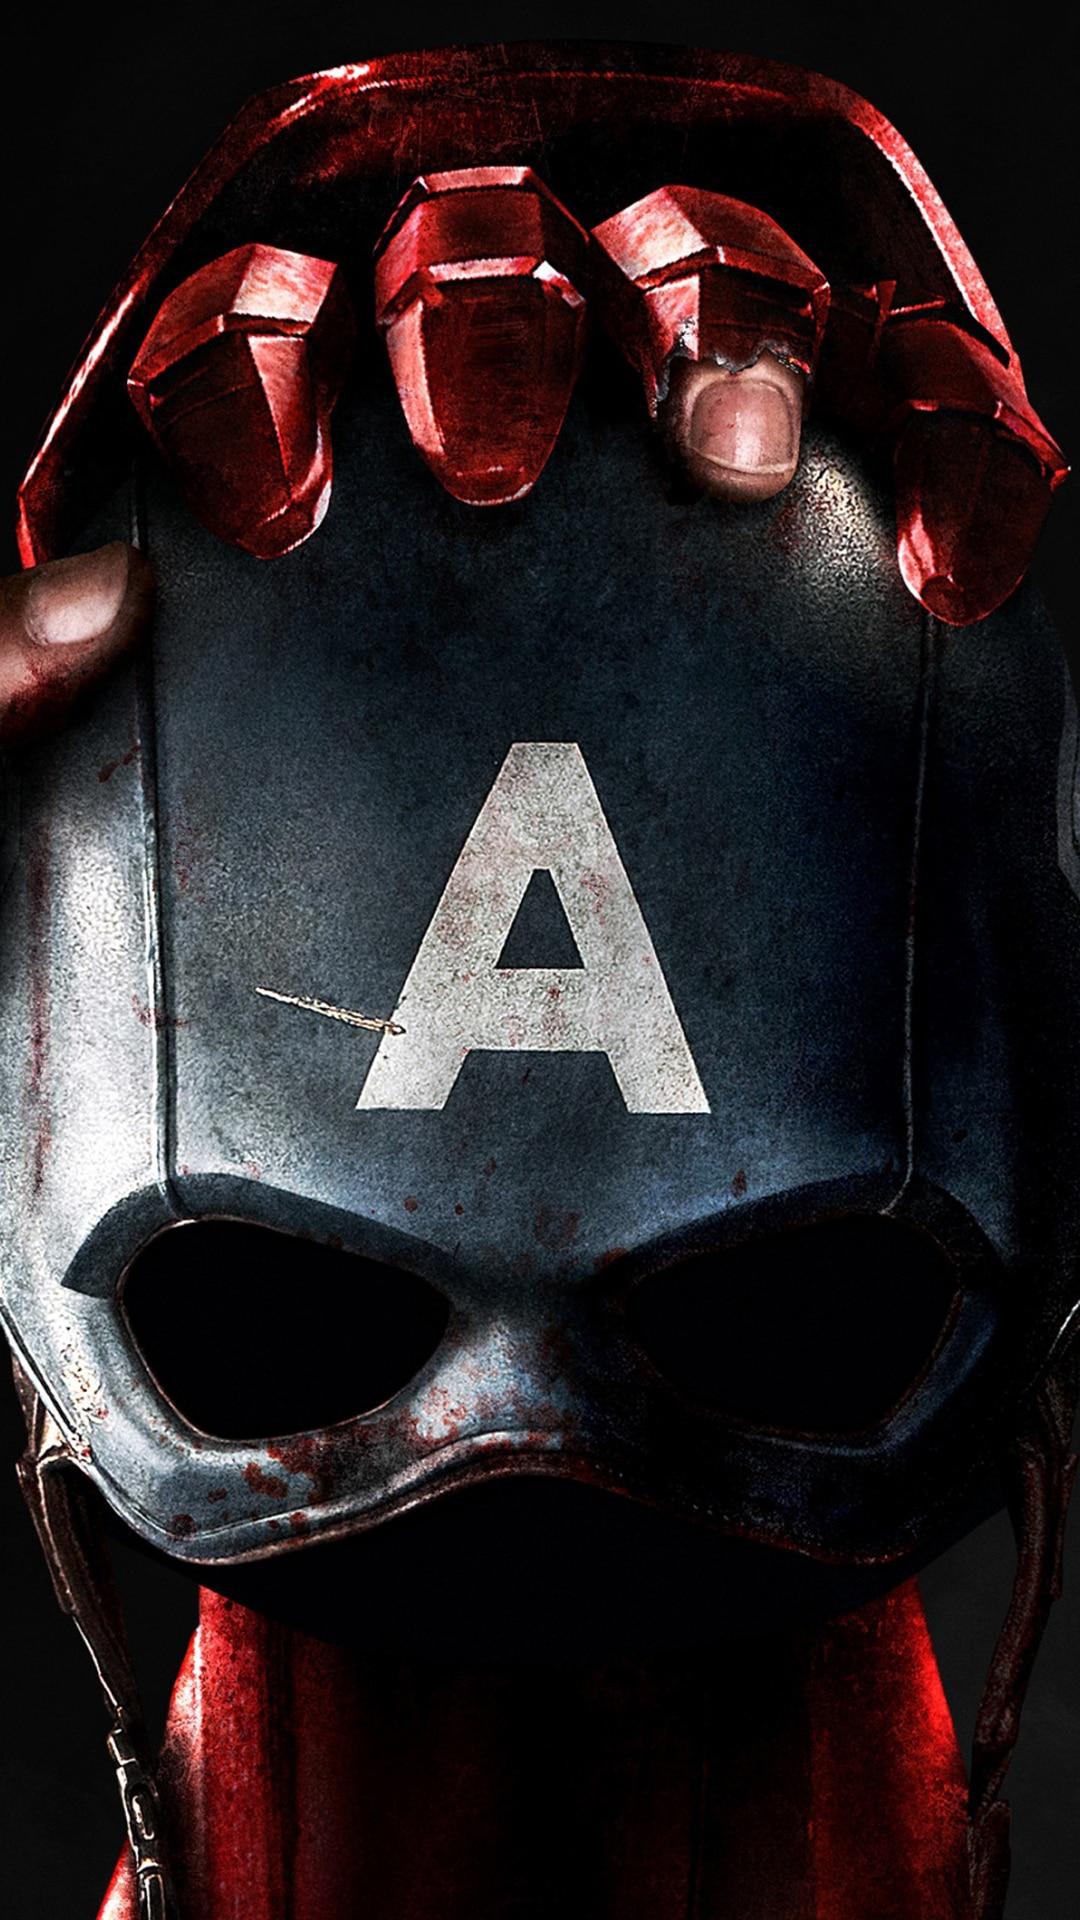 Hd wallpaper whatsapp download - Captain America Civil War Hd Wallpapers For Iphone Apple